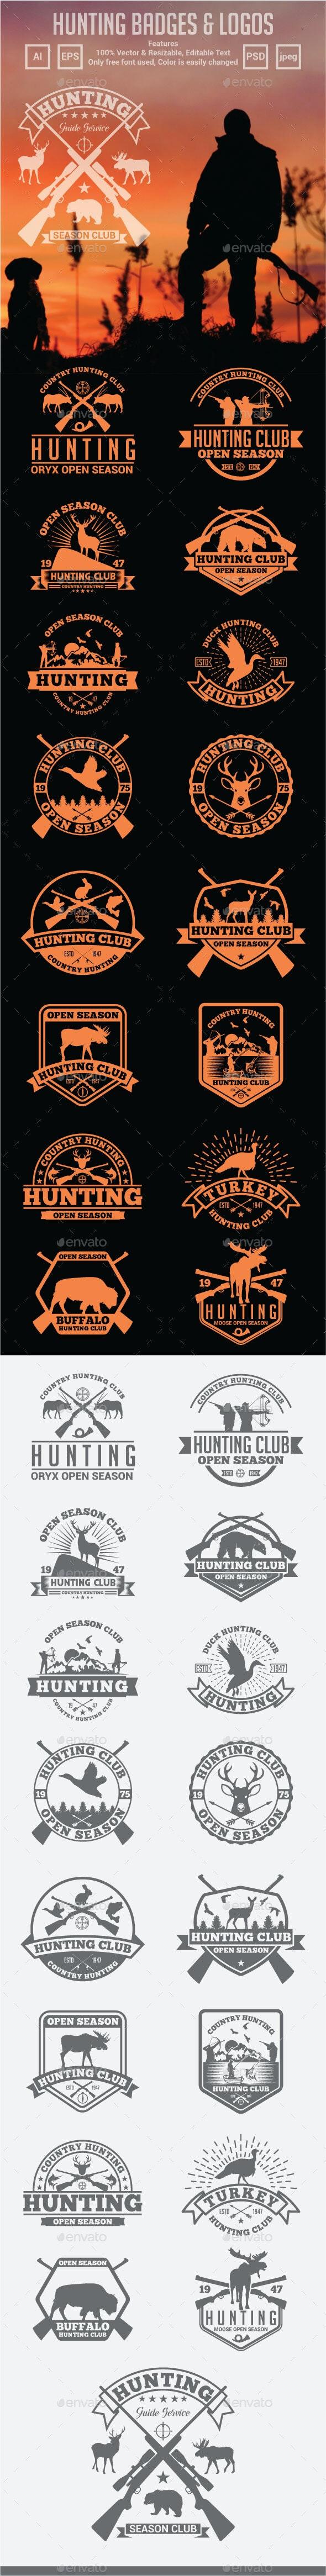 Hunting Badges & Logos - Badges & Stickers Web Elements